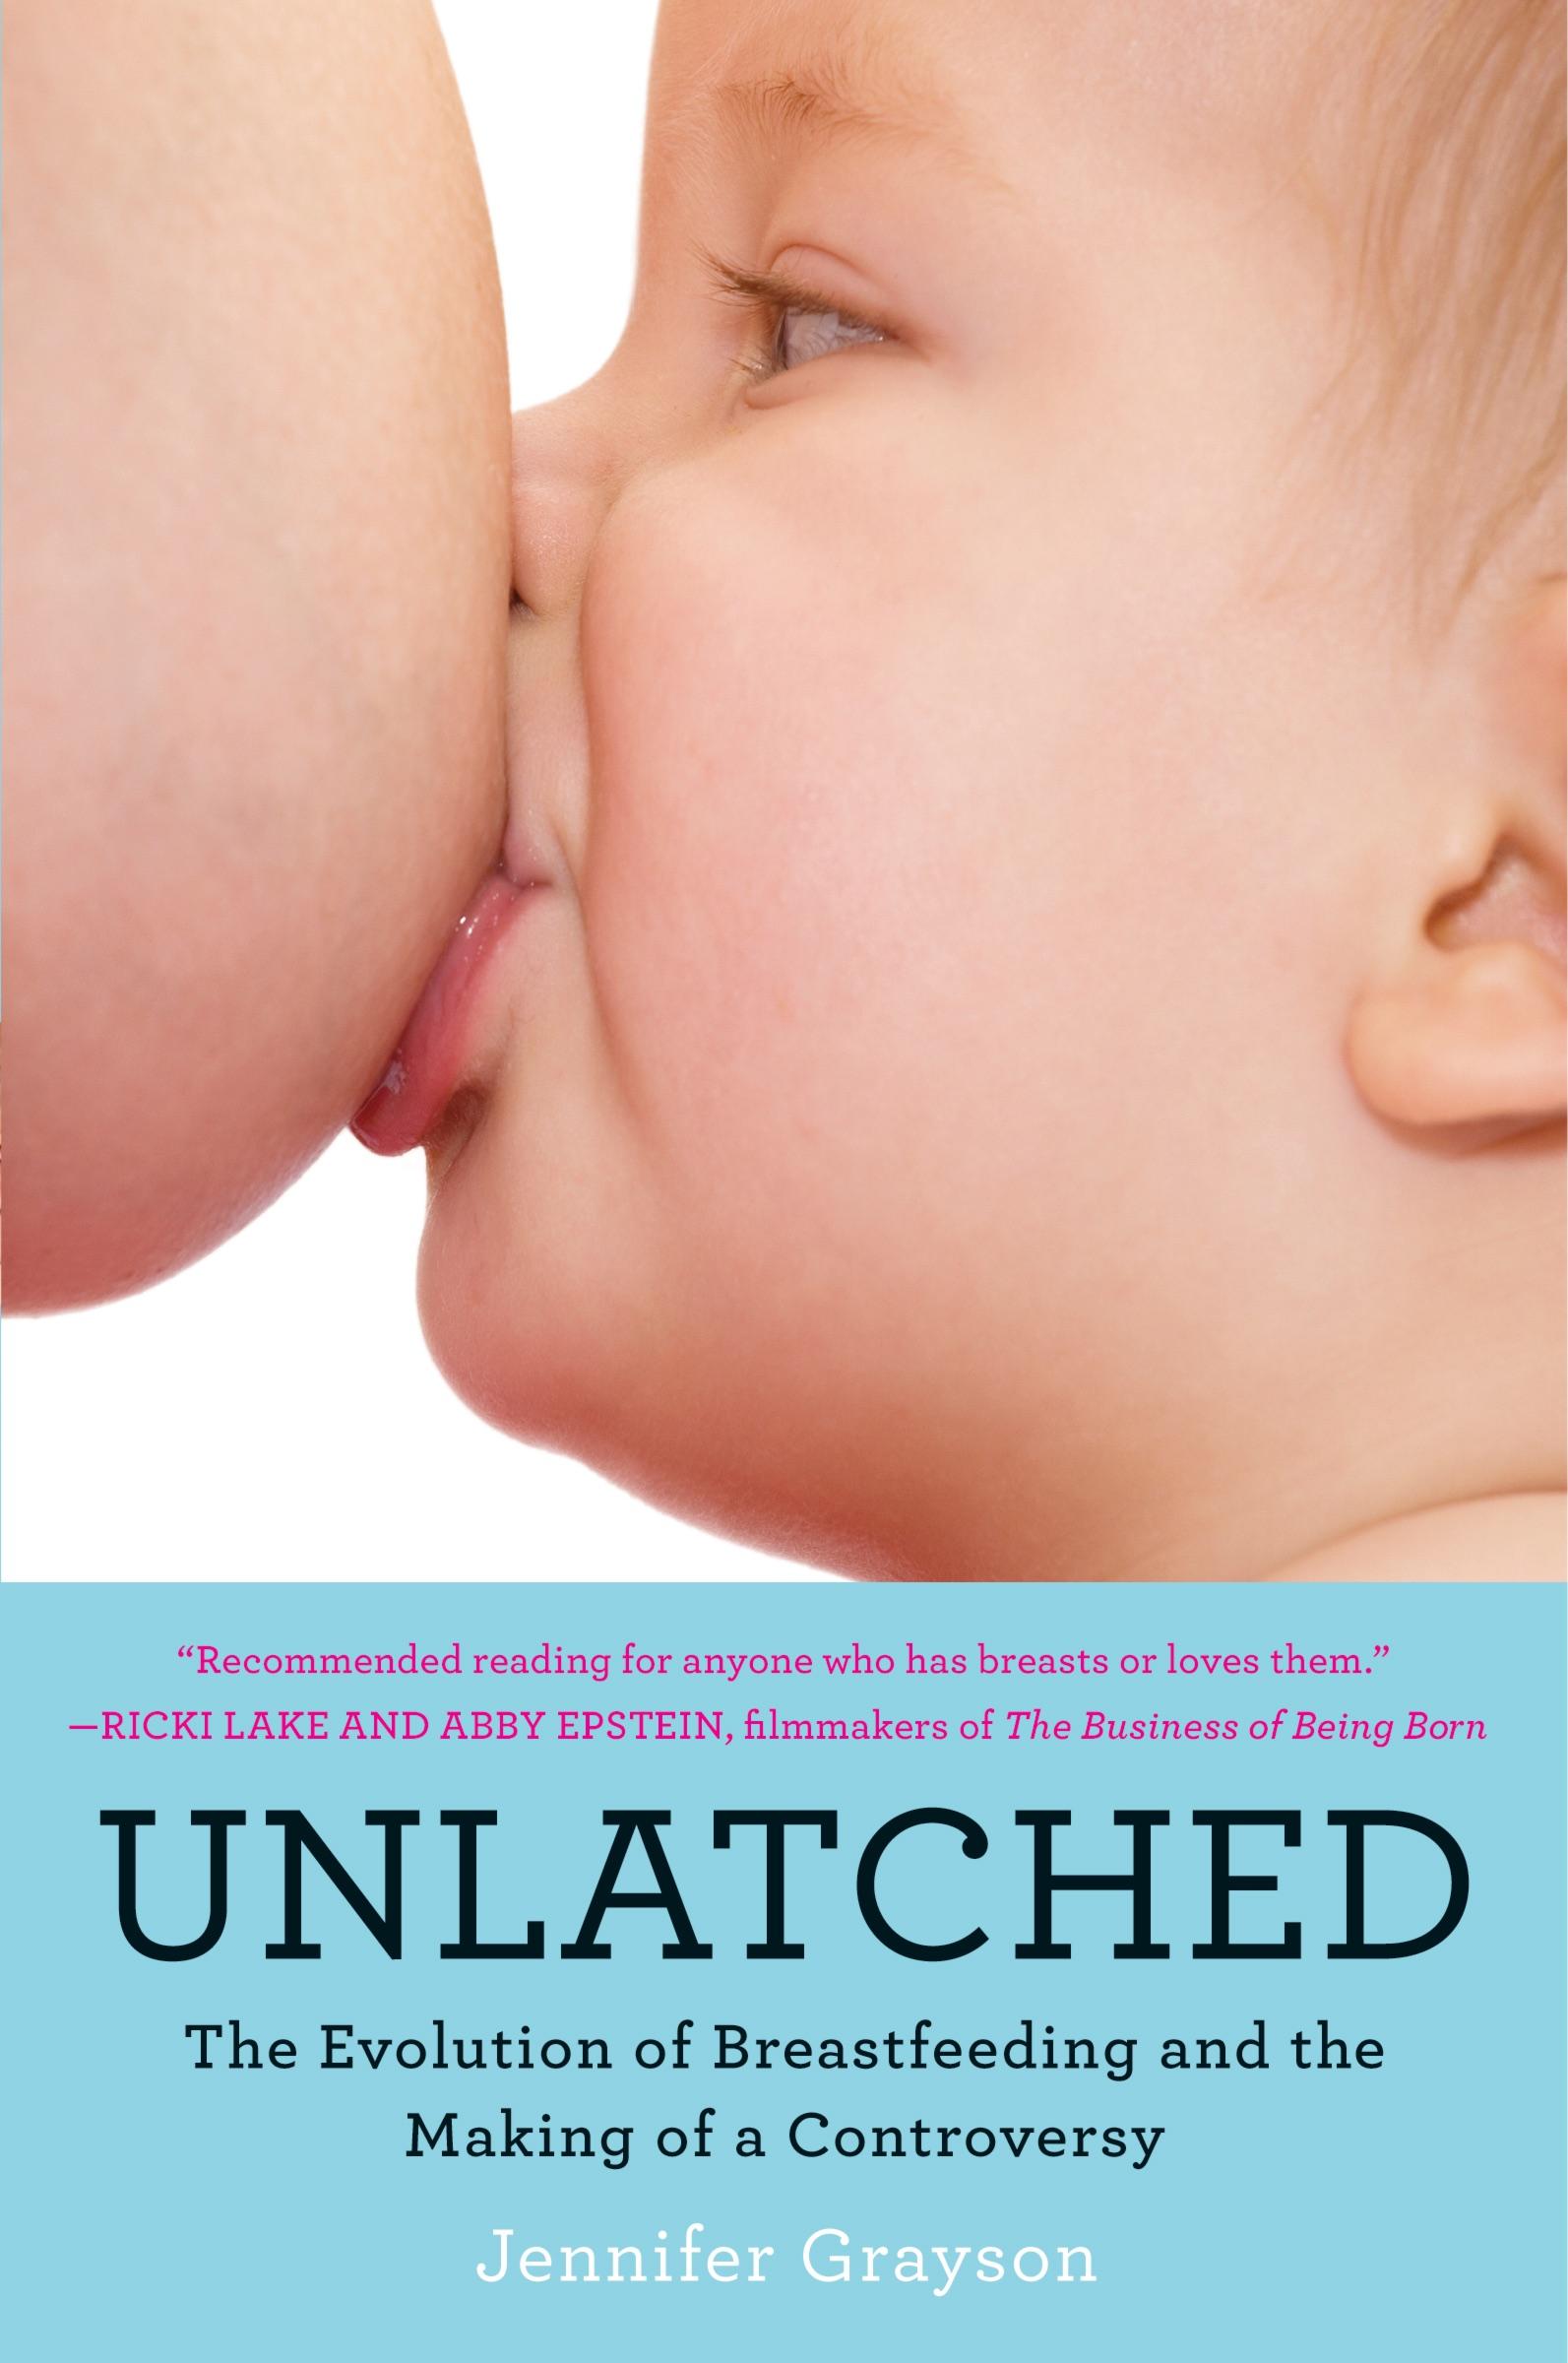 unlatched-book.jpg